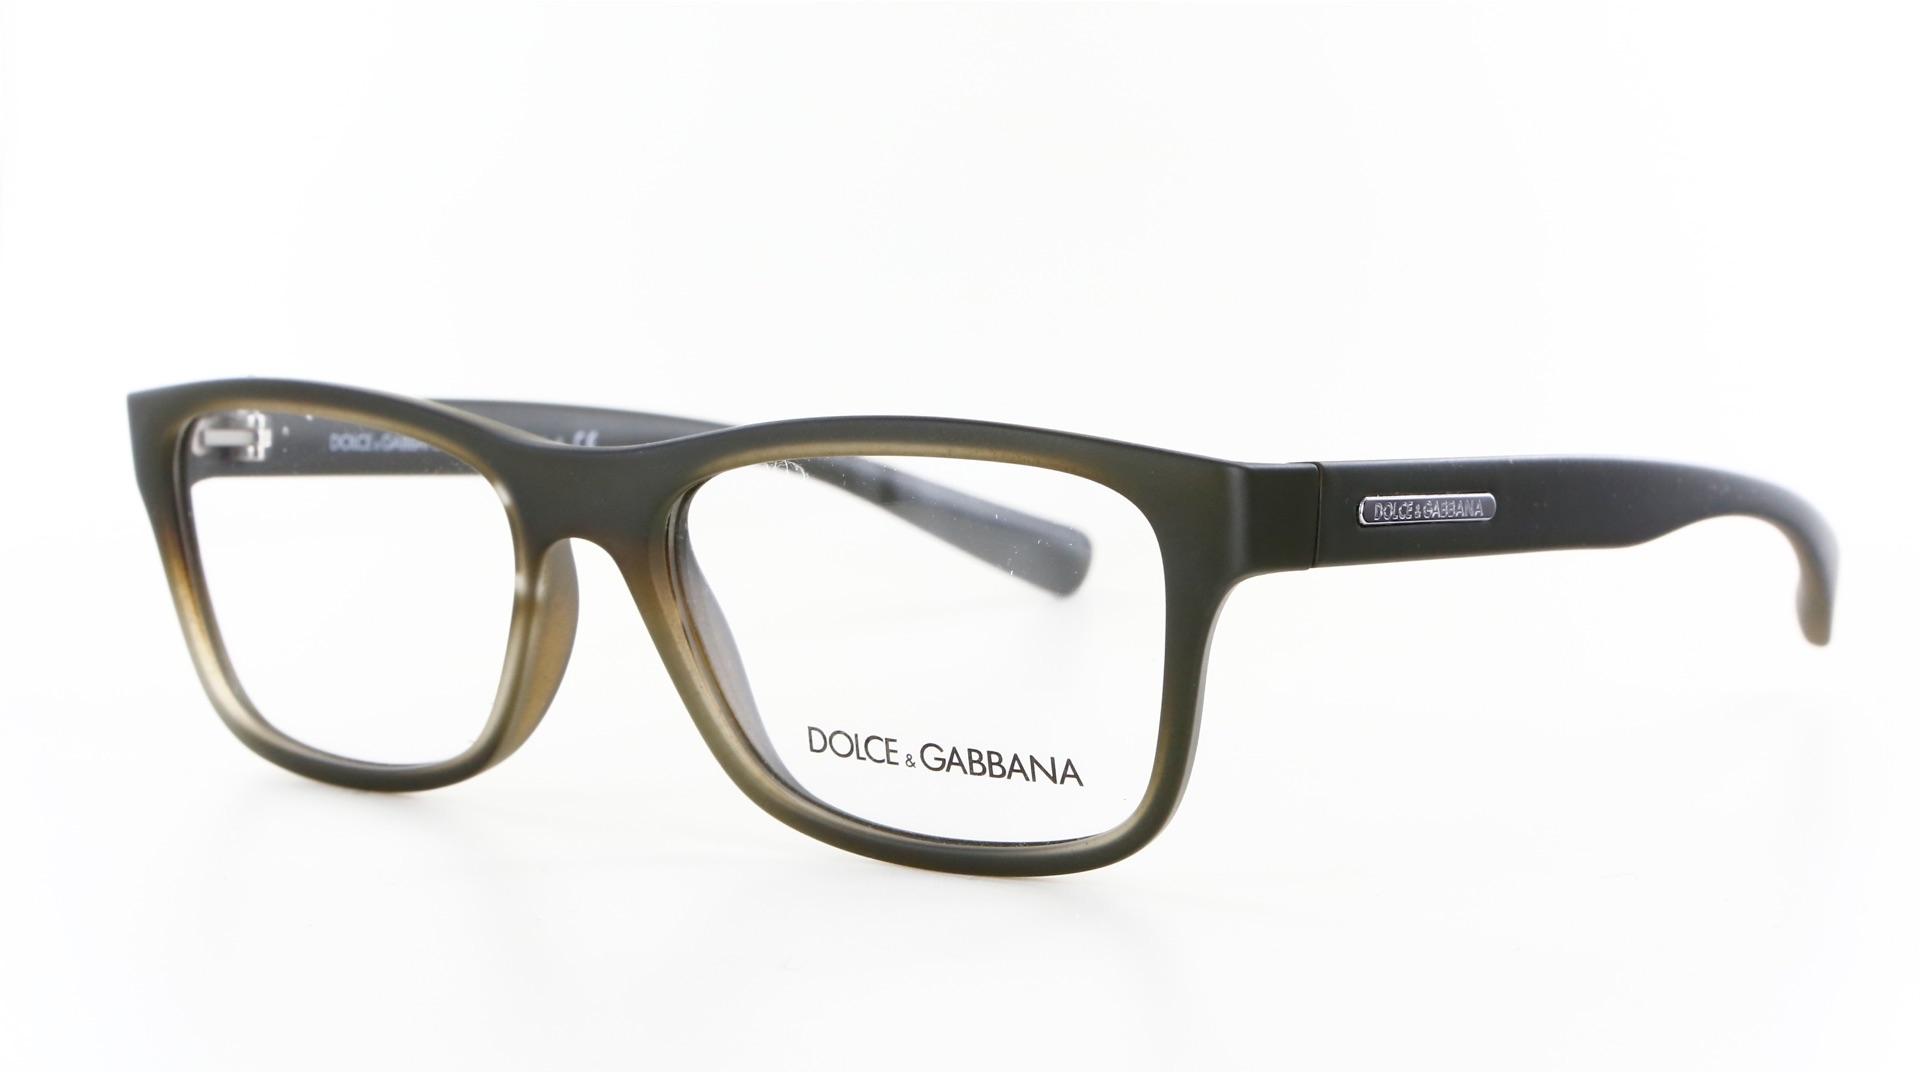 Dolce & Gabbana - ref: 71987